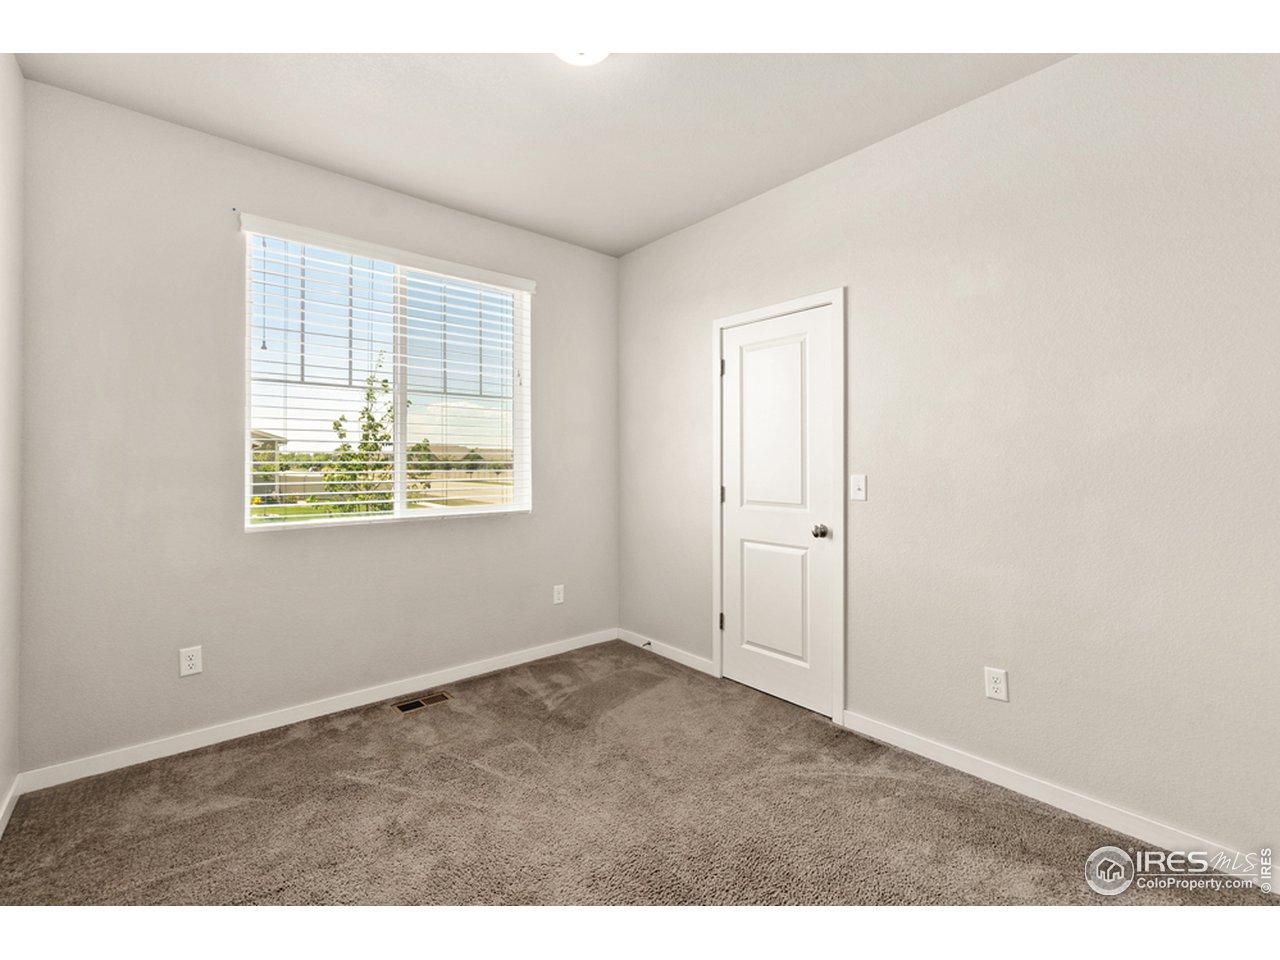 Bedroom 3 features a walk-in closet